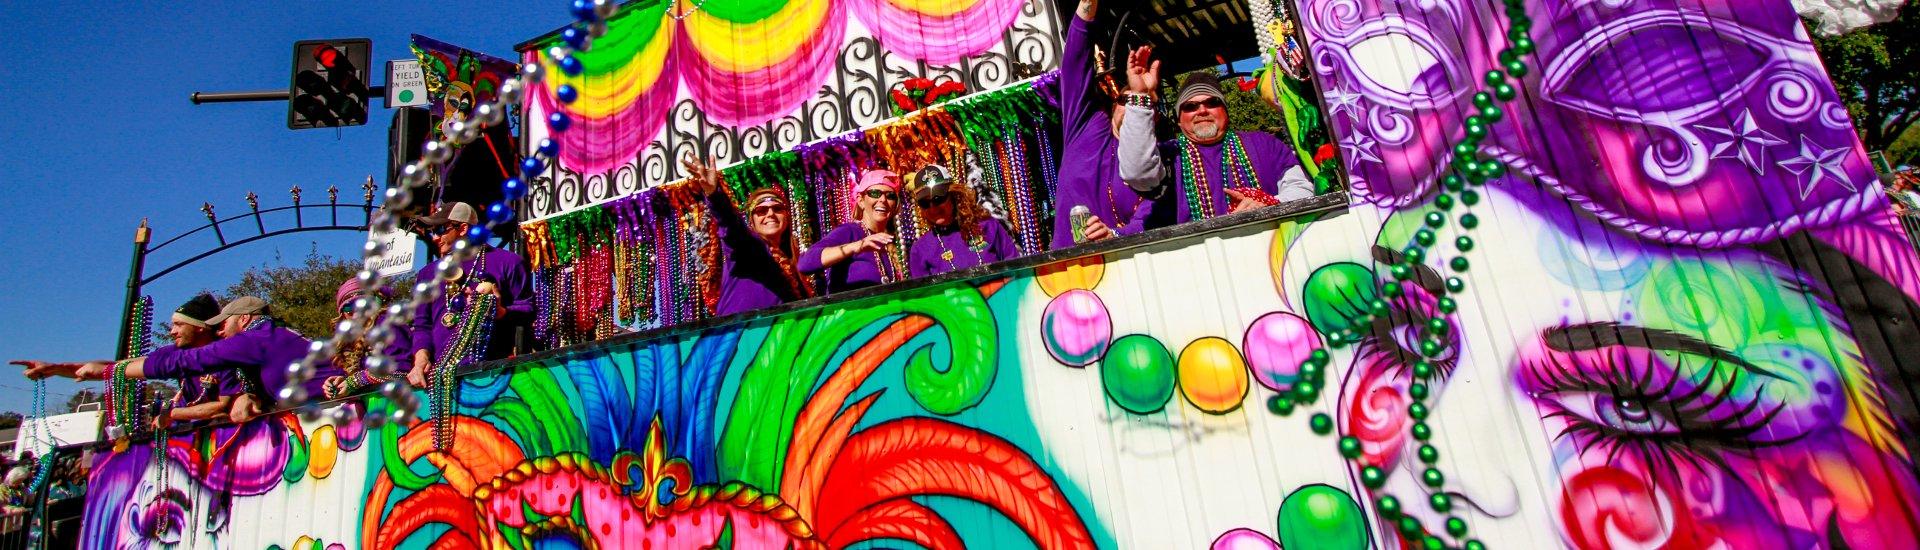 Annual Gulf Coast Carnival Association Mardi Gras Parade